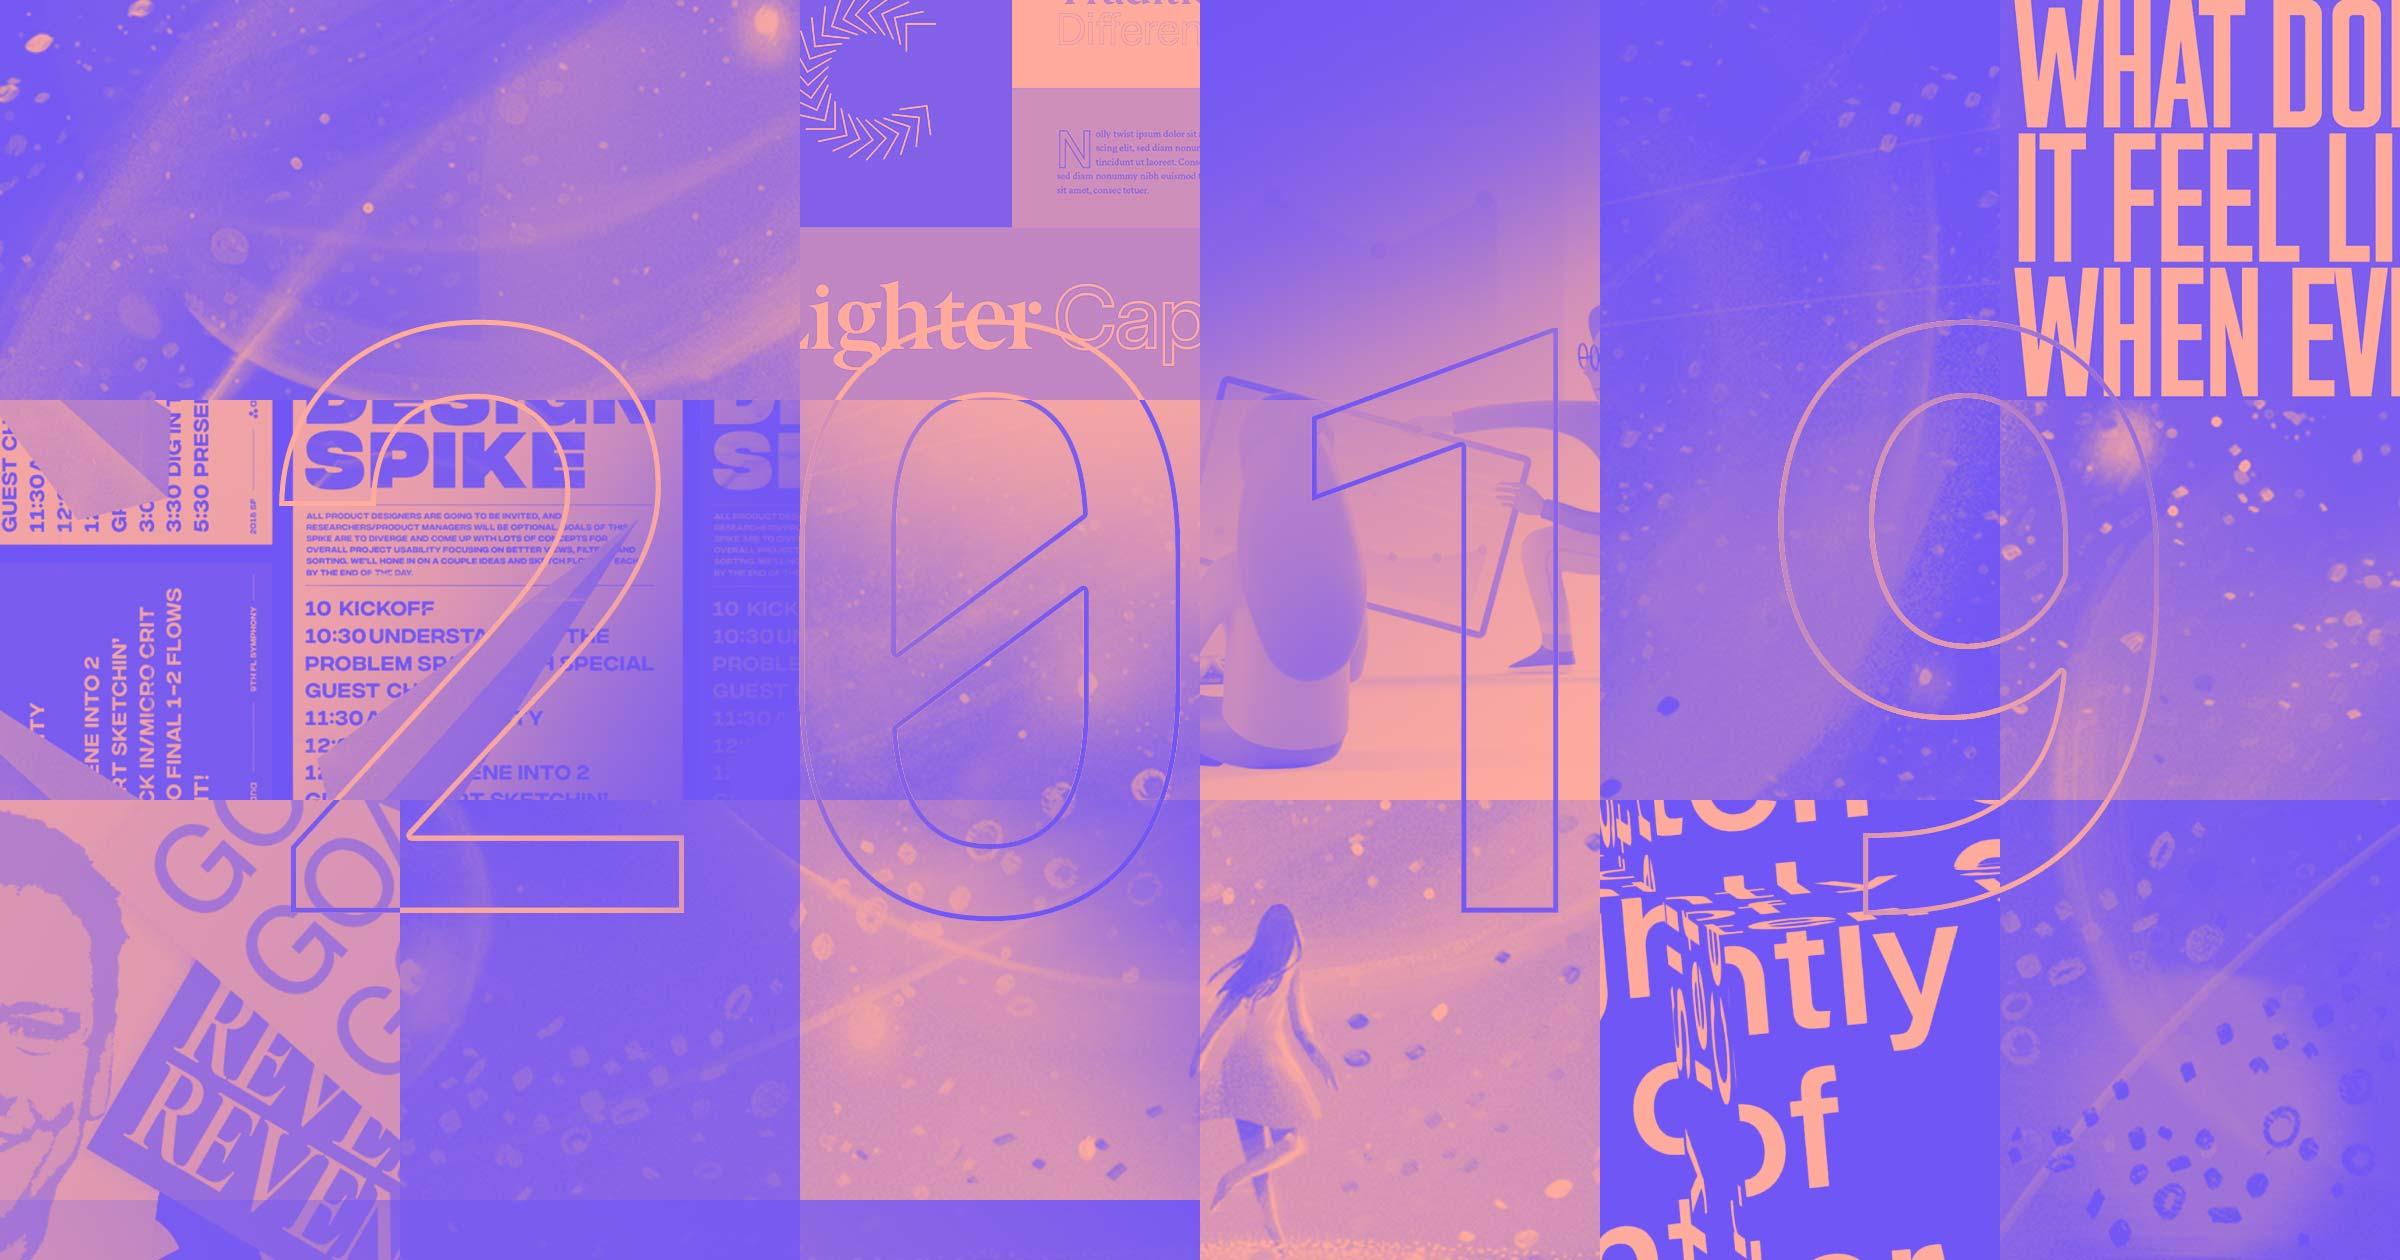 20 web design trends for 2019